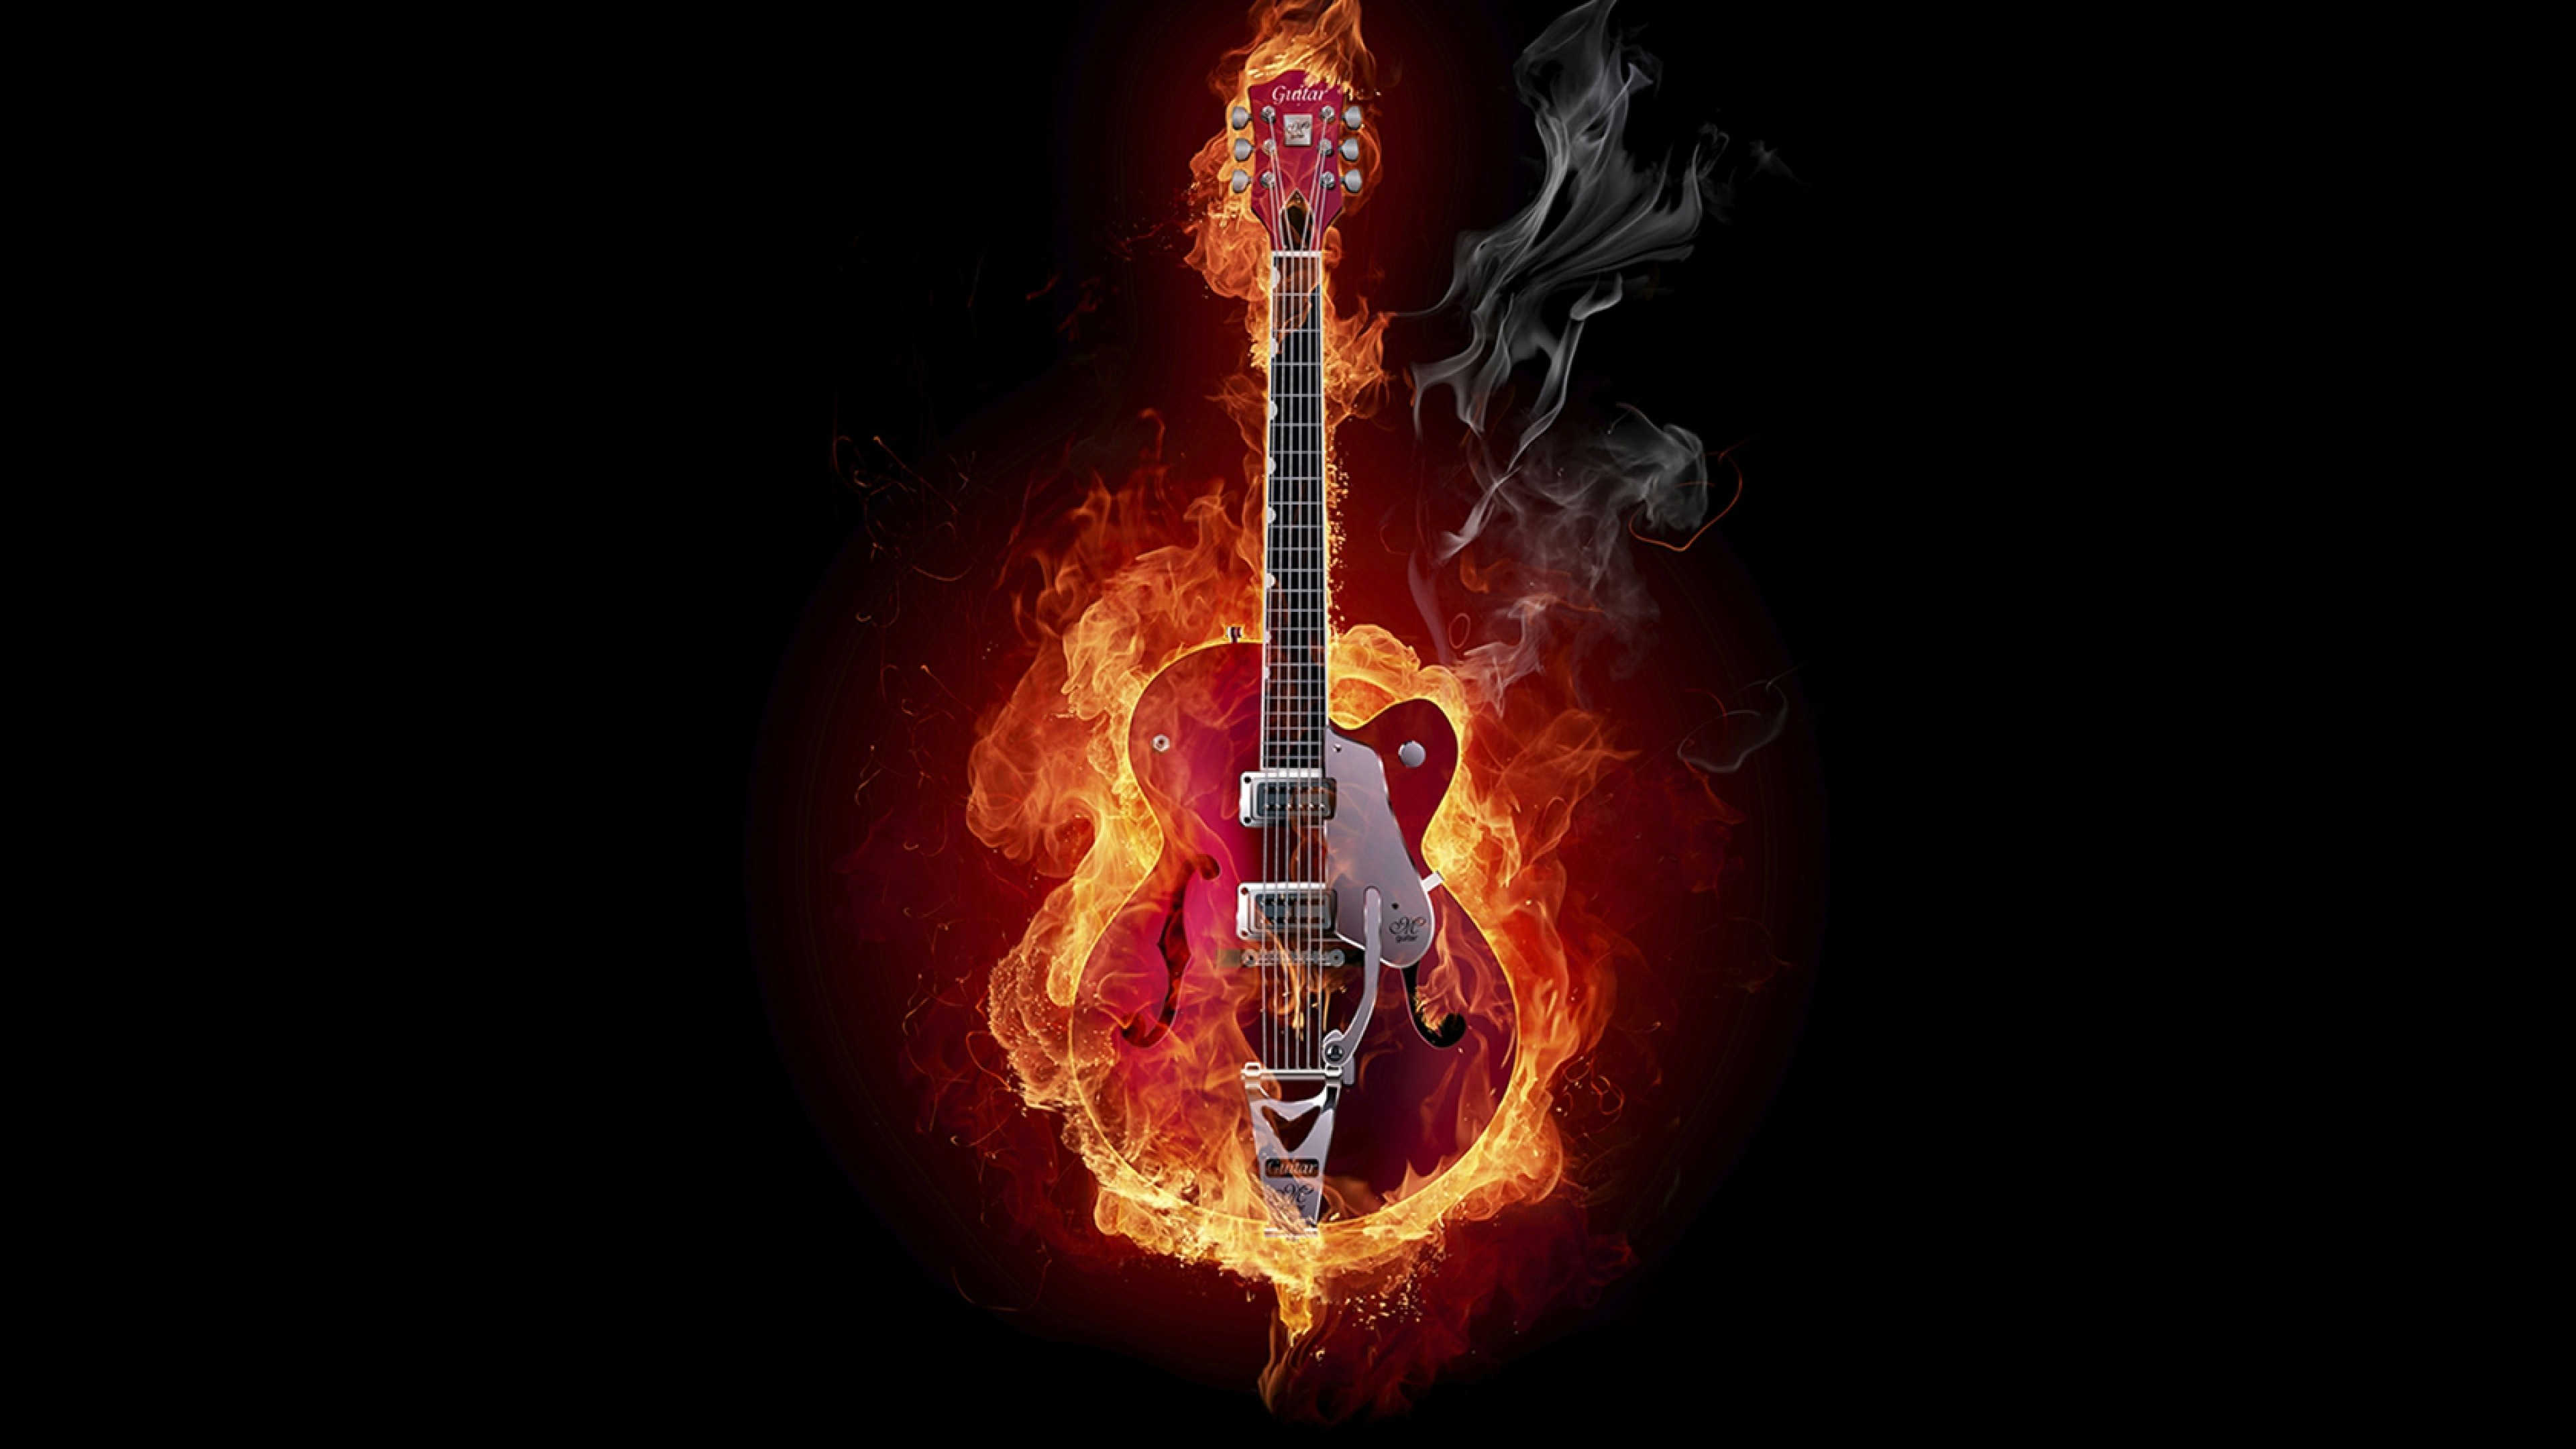 Fender Guitar Wallpaper 59 Images